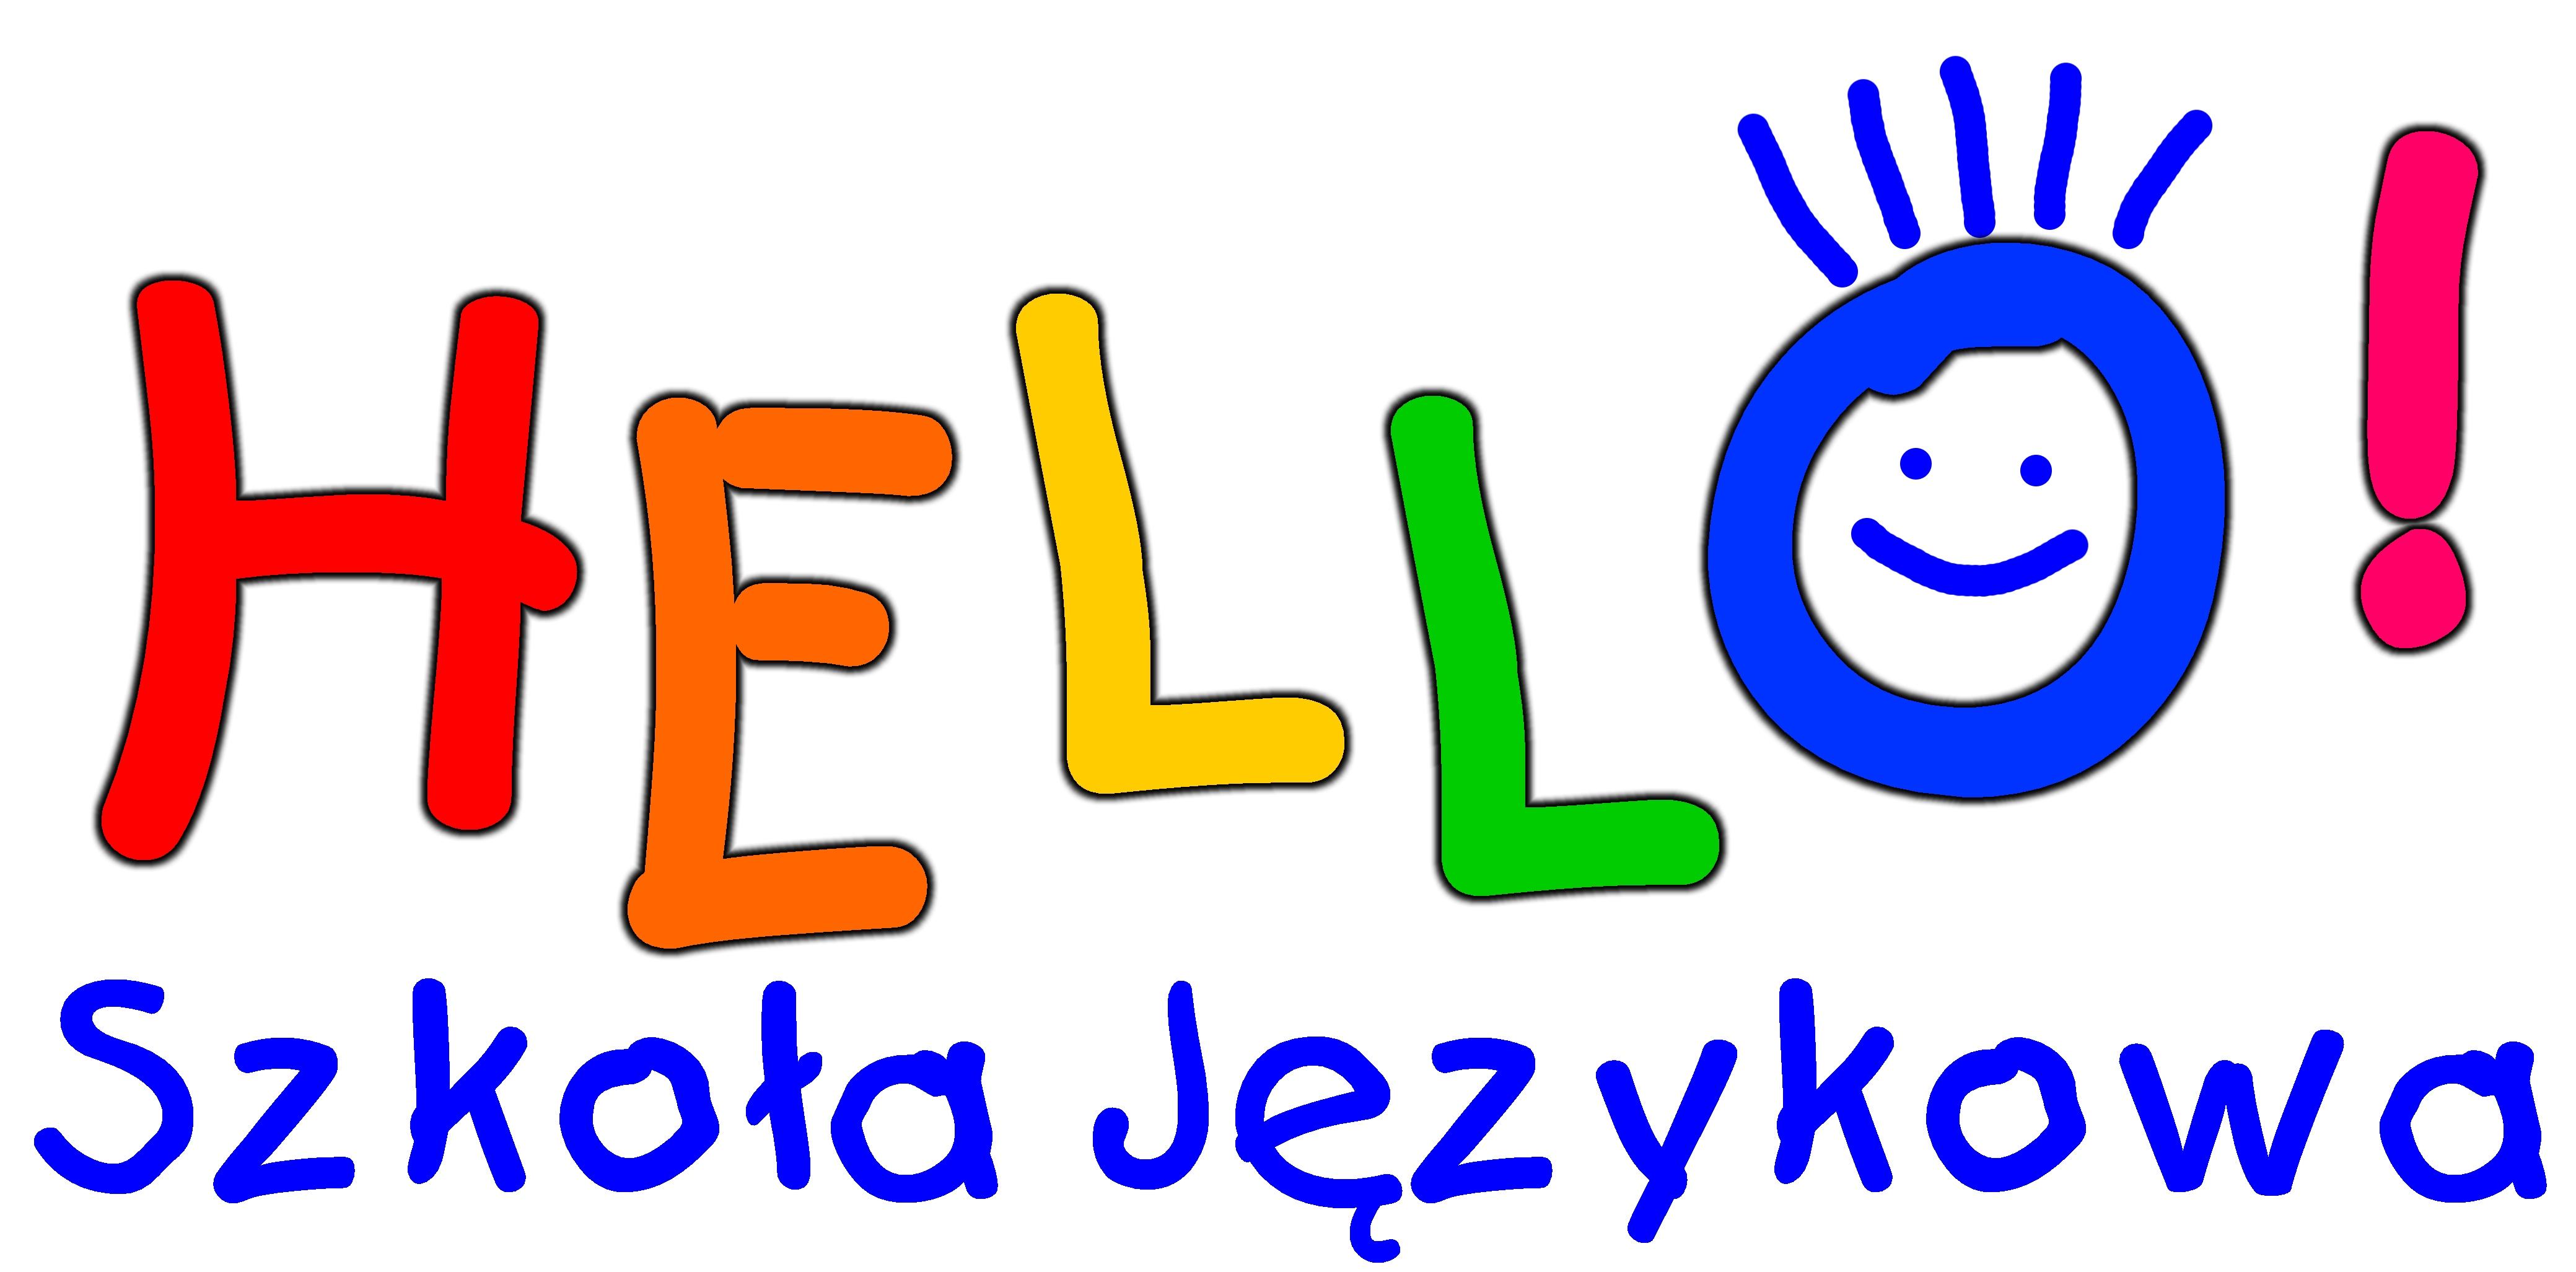 Logo hello 2013JPG